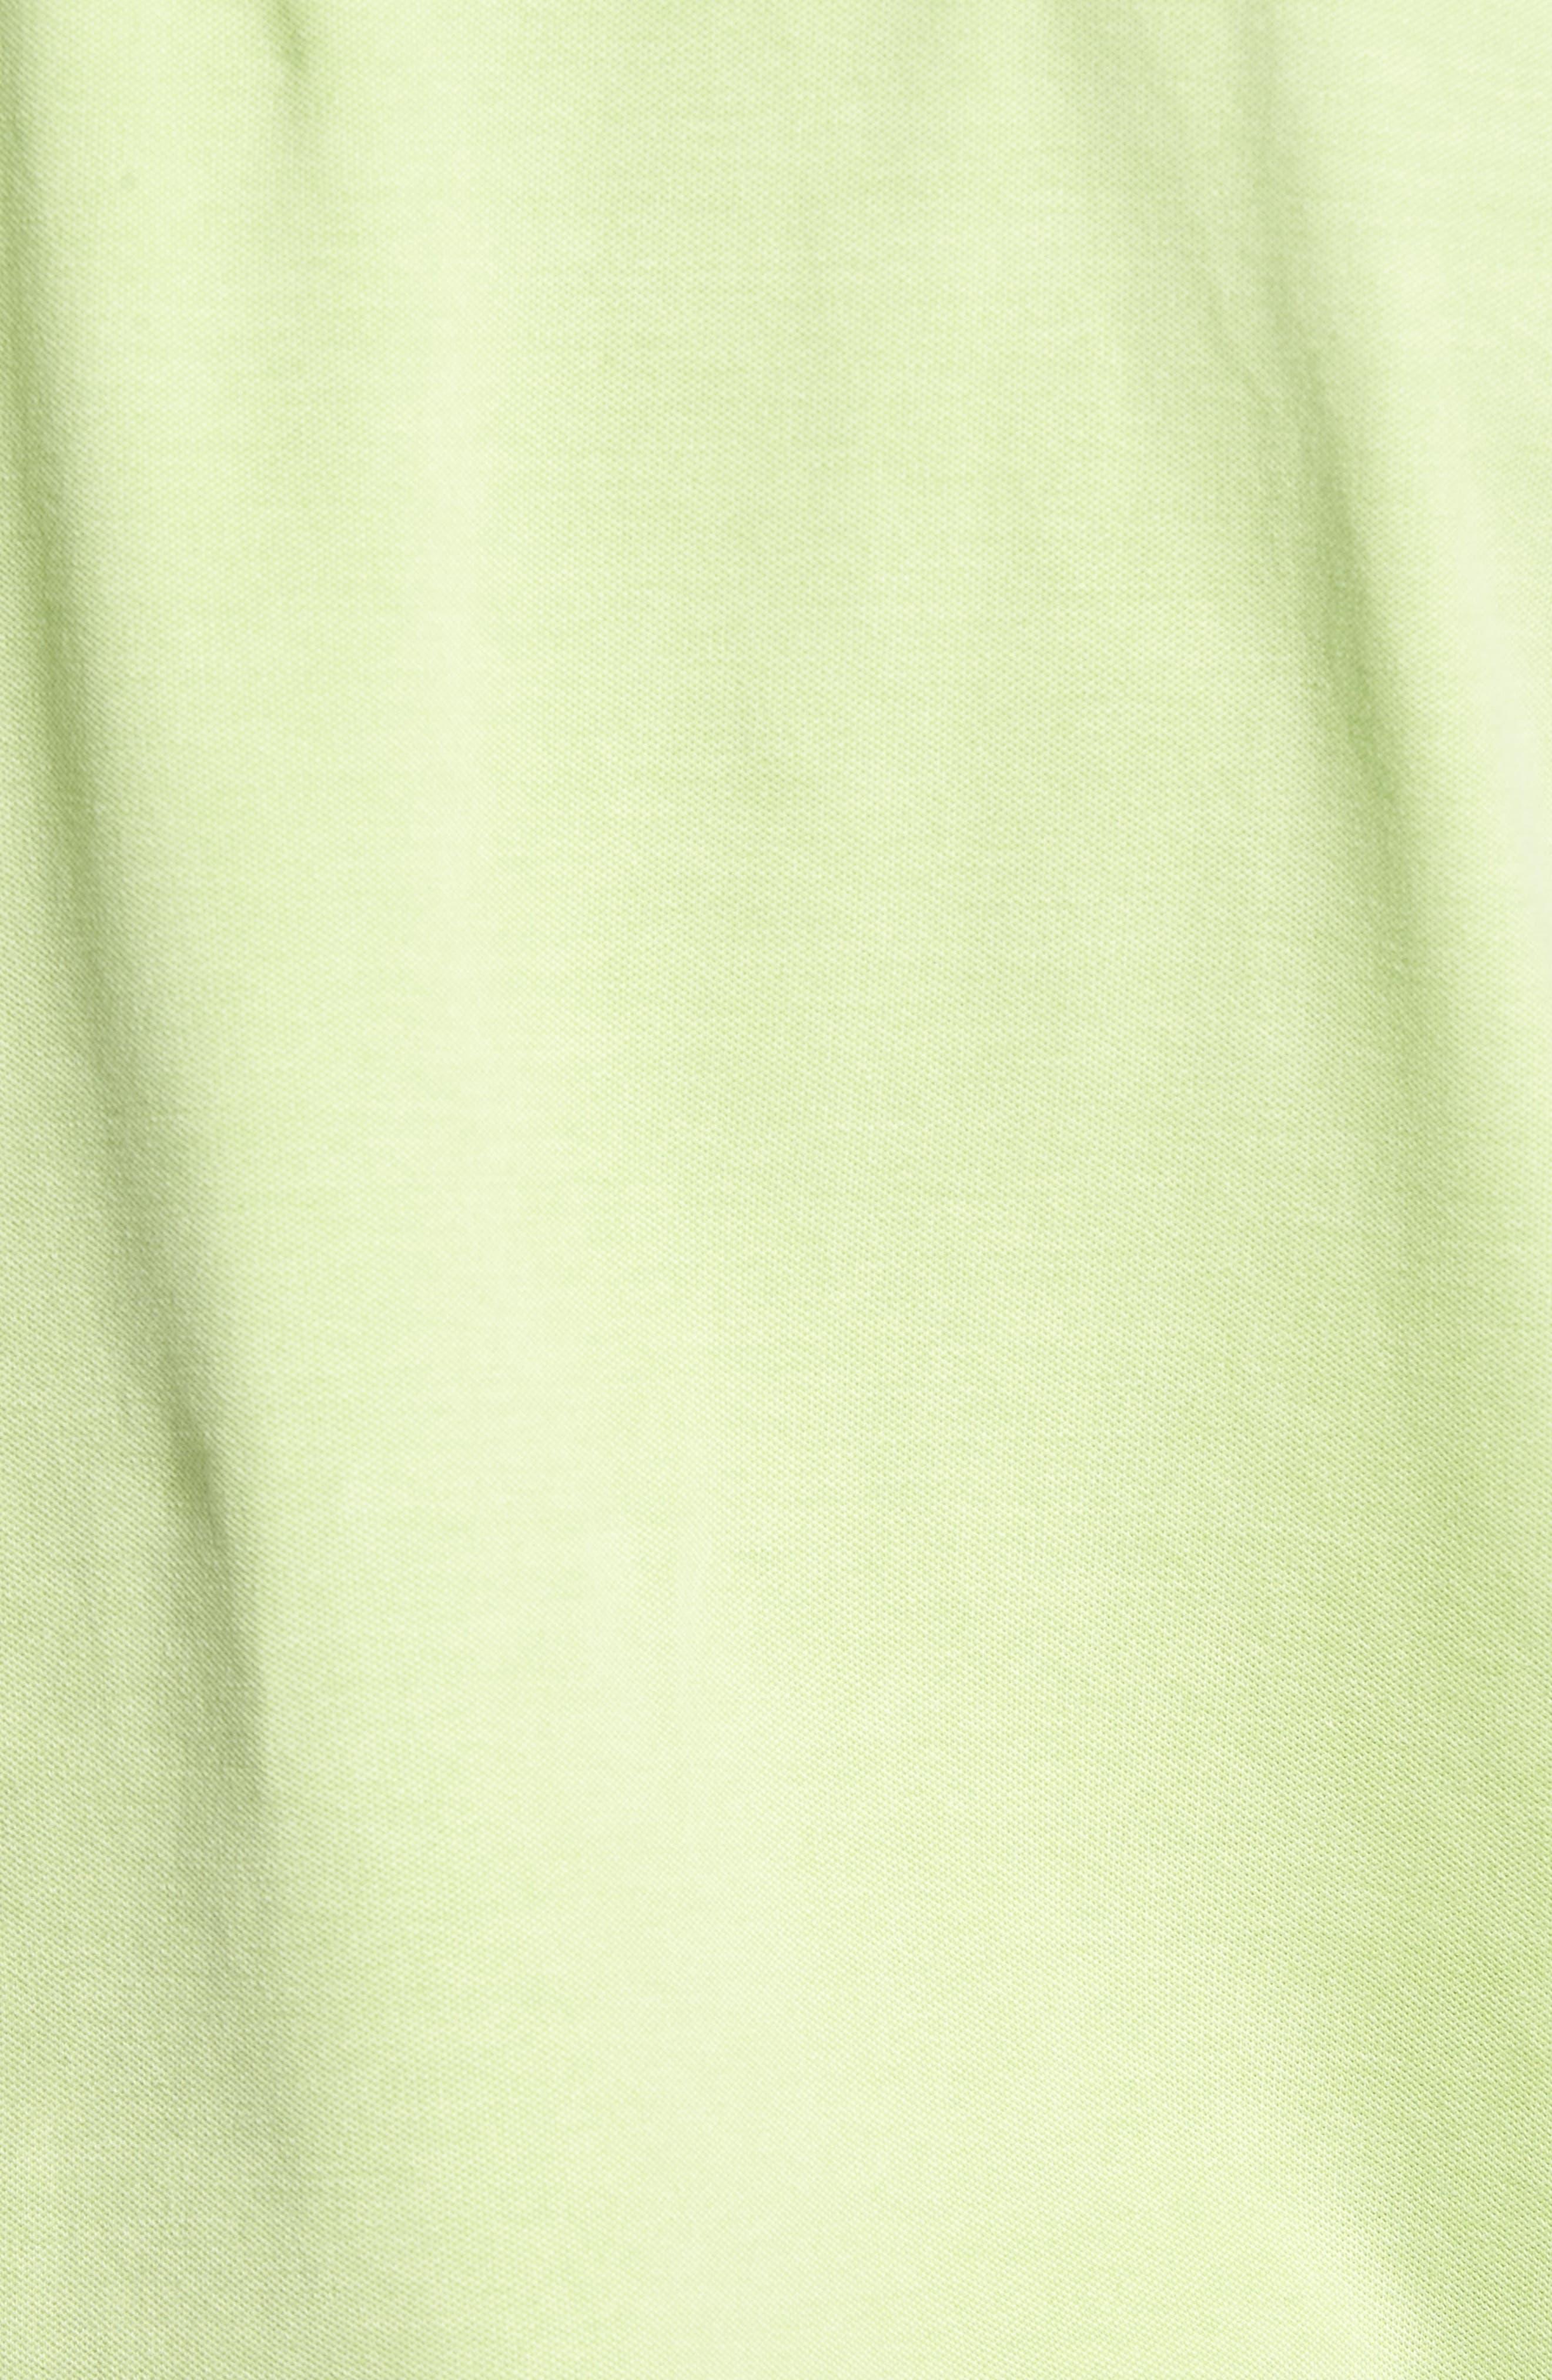 Paul Stretch Piqué Polo,                             Alternate thumbnail 5, color,                             Margarita